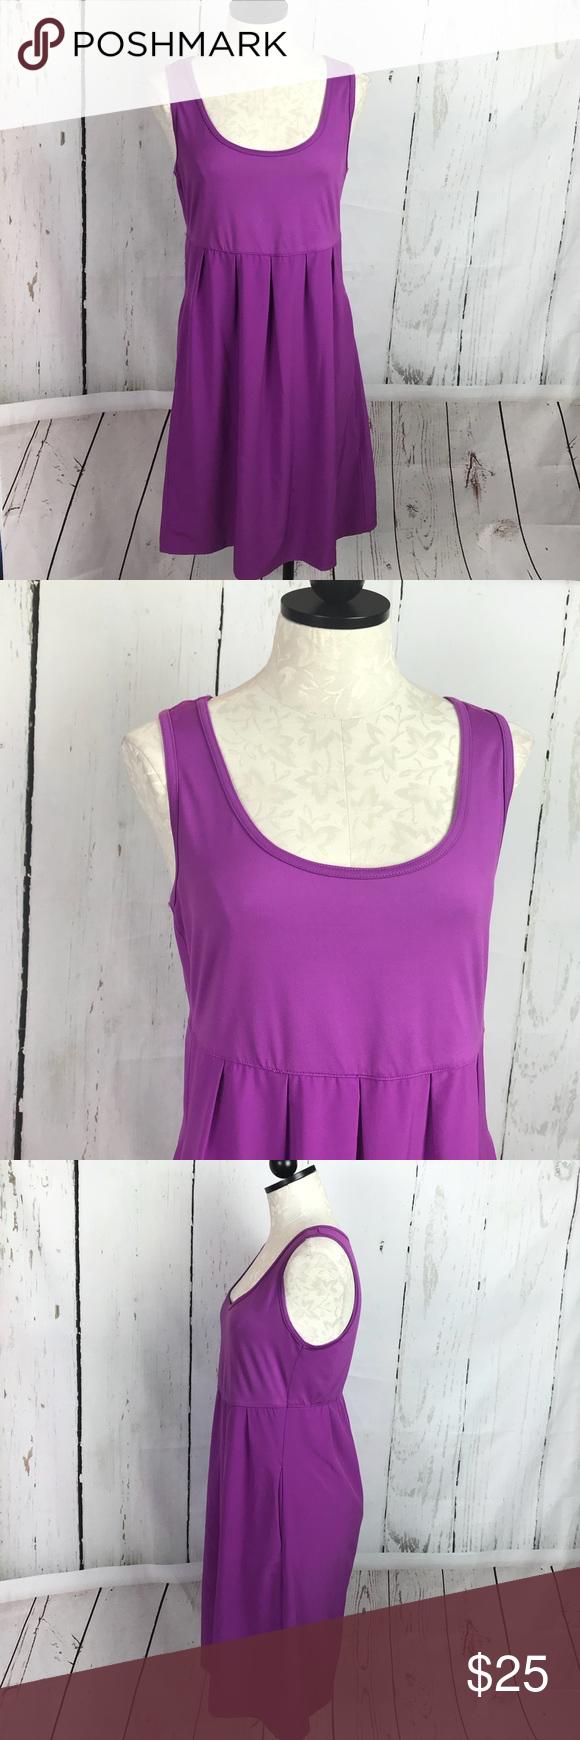 e7b09d1e941 Columbia Marakesh Maven Dress Fantastic plum purple dress with Omni Shade  Omni Wick Shaping on top